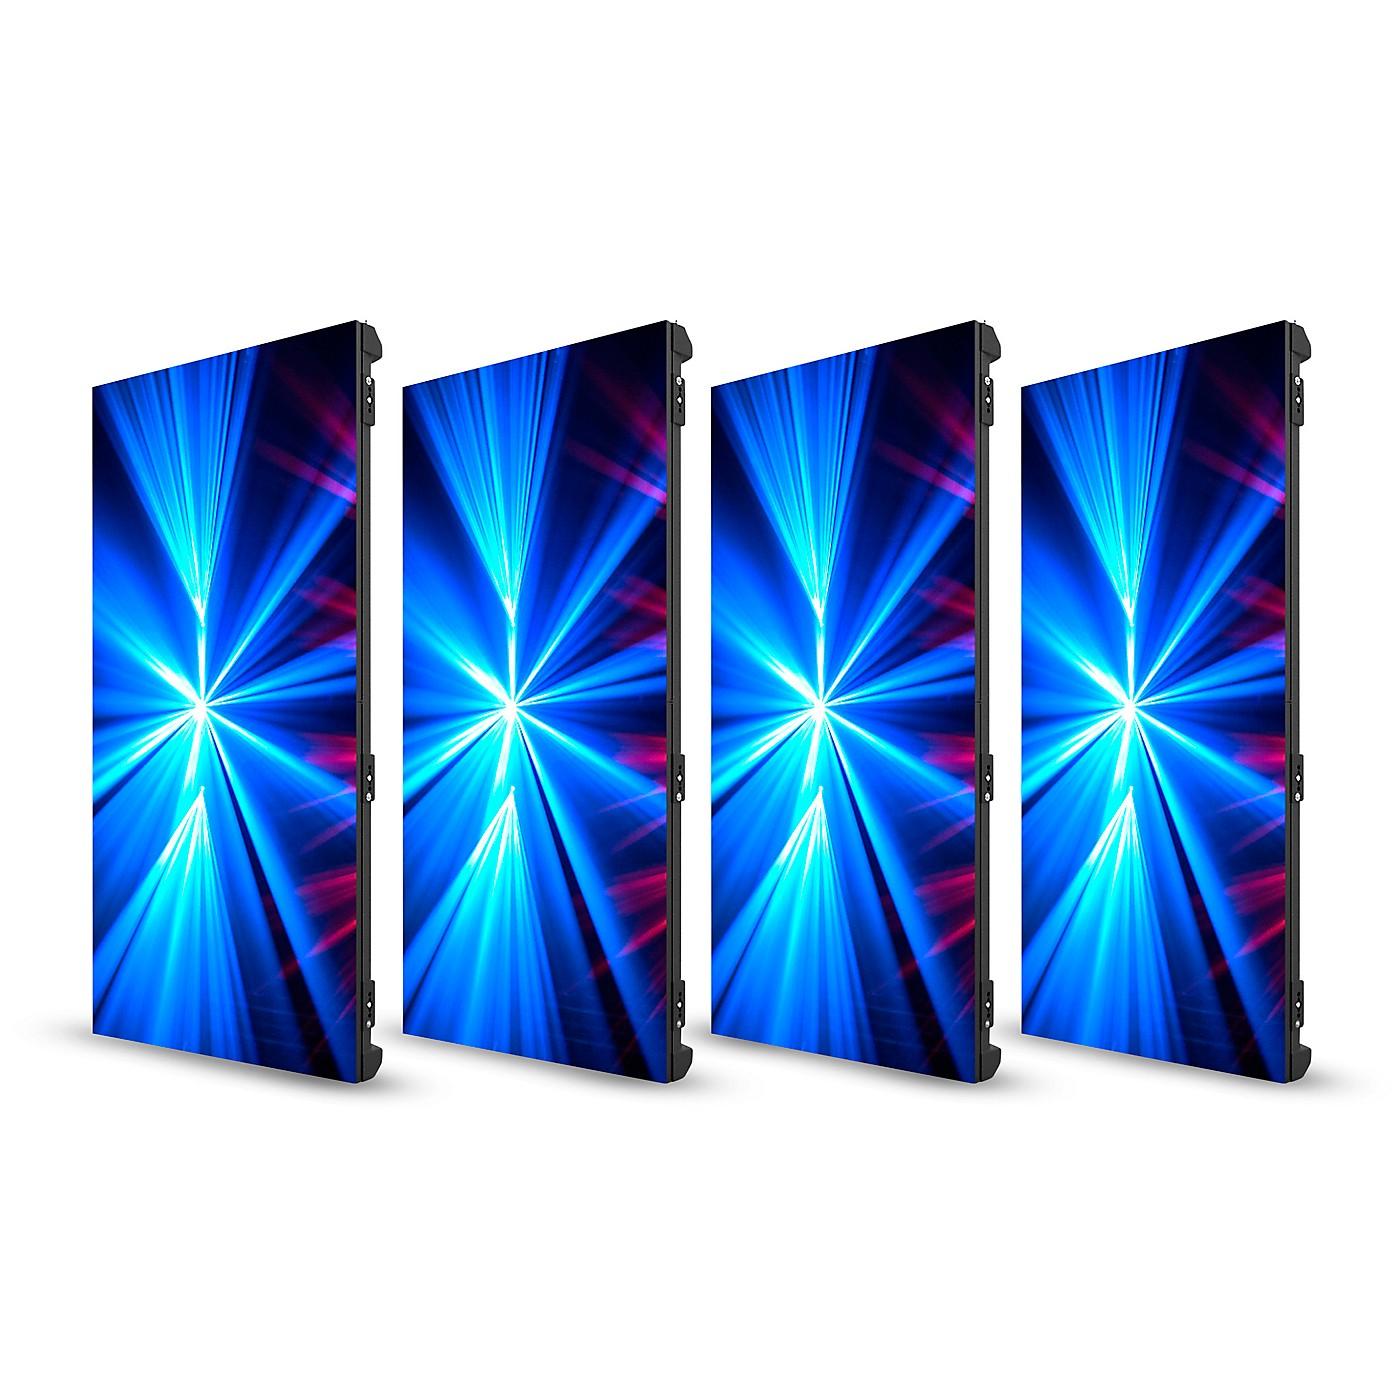 CHAUVET DJ 4-Pack of Vivid 4 Modular Video Panels with Road Case thumbnail